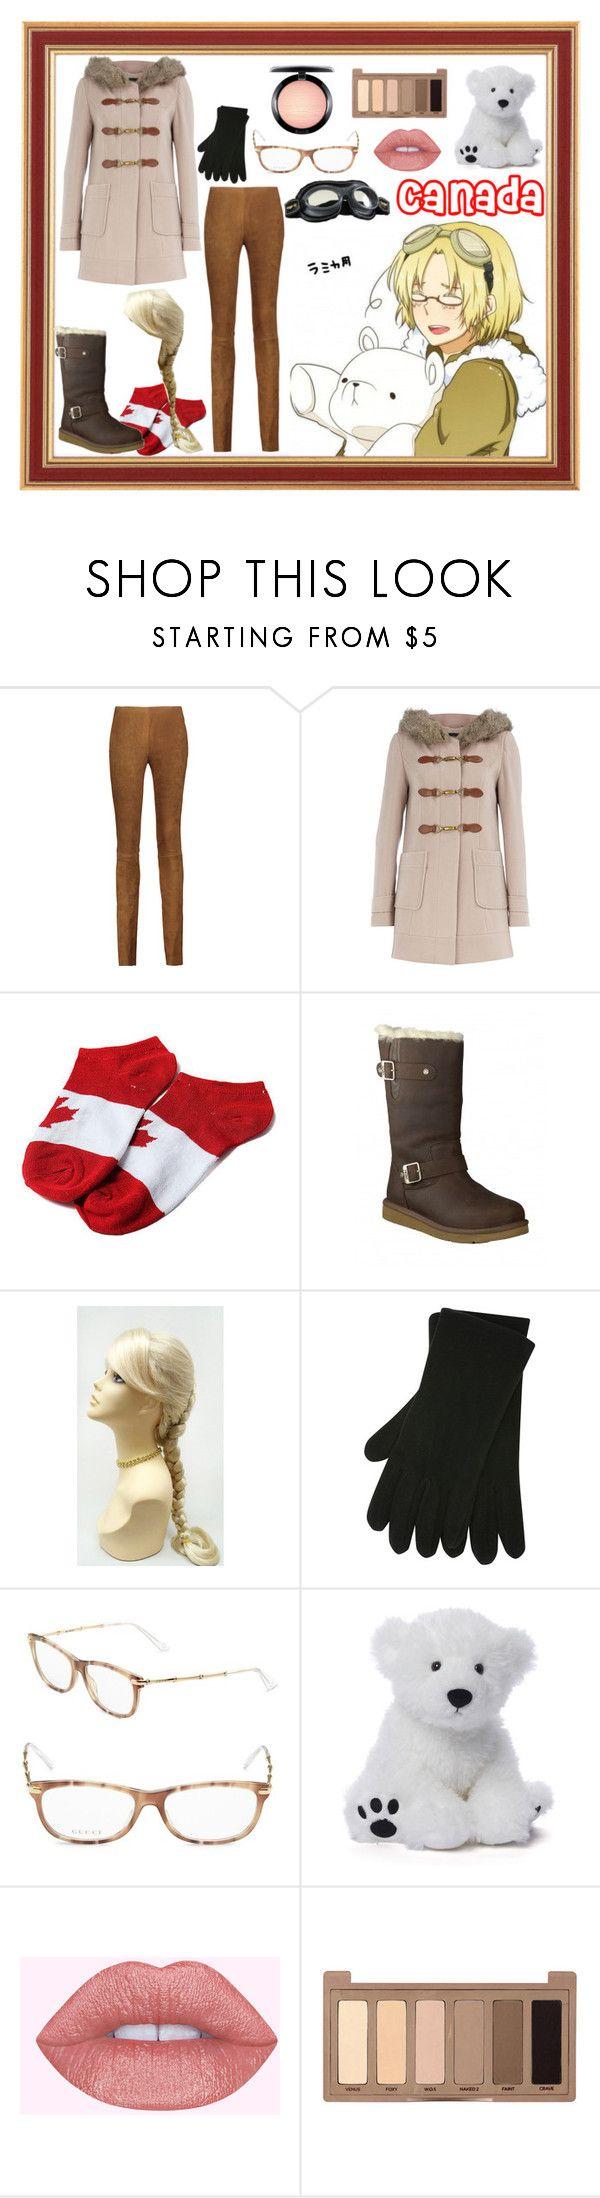 """Hetalia: Canada"" by mrs-edelstein ❤ liked on Polyvore featuring Cushnie Et Ochs, Dorothy Perkins, UGG Australia, M&Co, Gucci, Gund, Urban Decay and MAC Cosmetics"